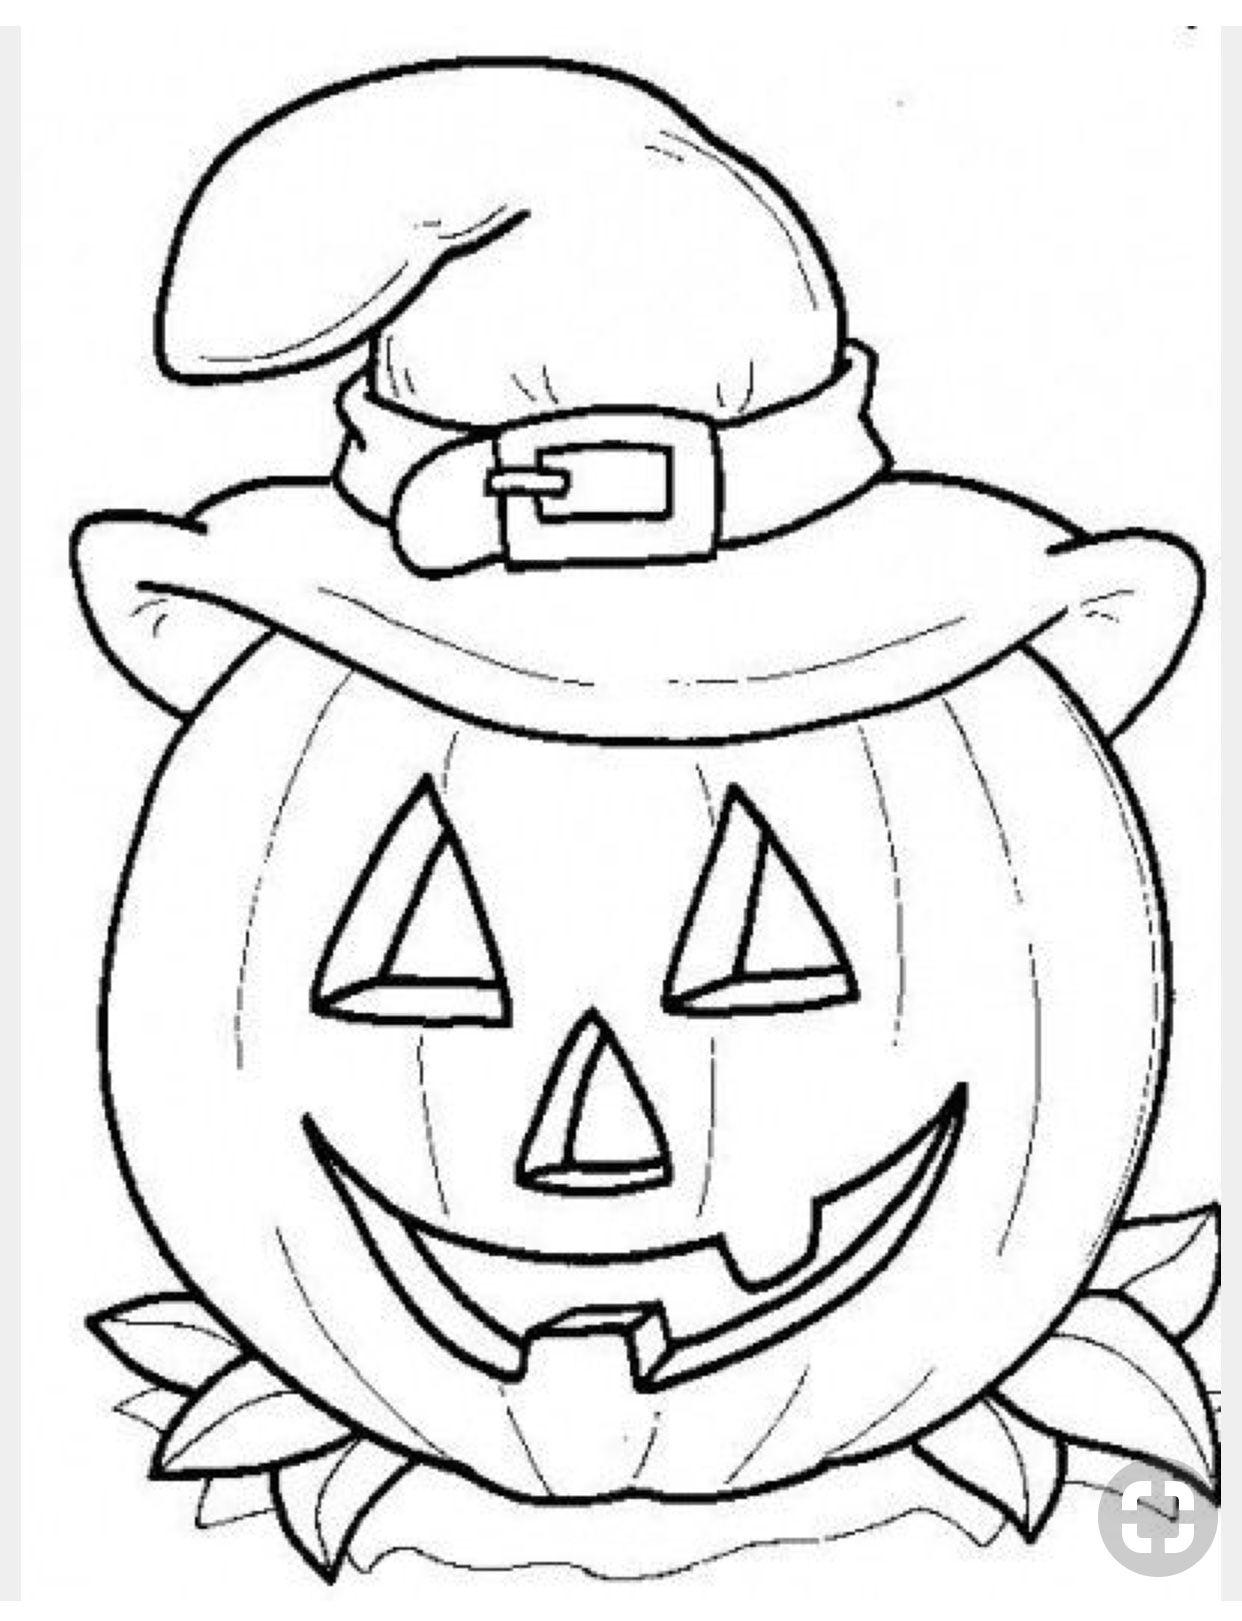 wood burning image by Susan Dirr Free halloween coloring